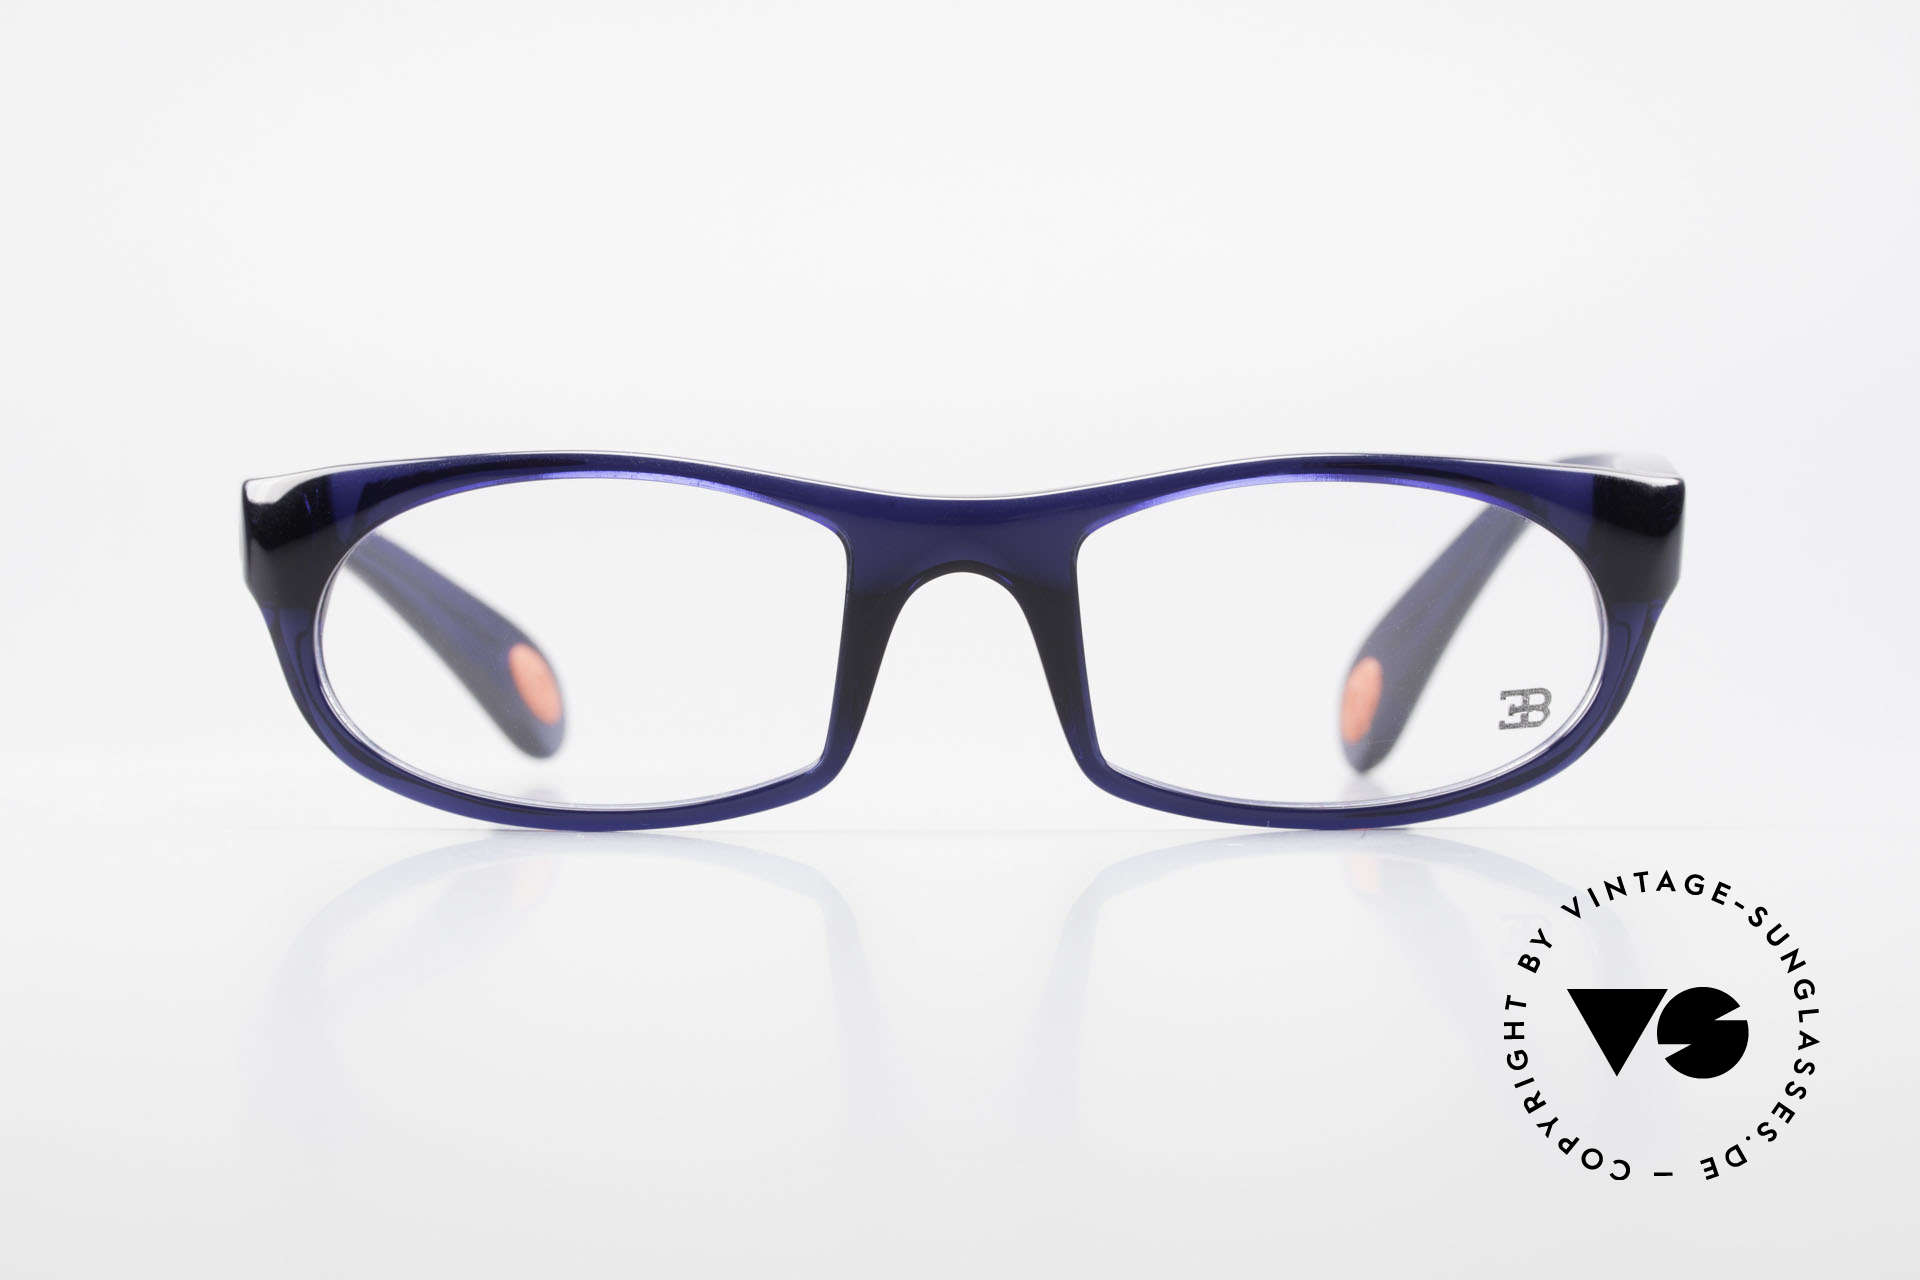 Bugatti 326 Odotype Sporty Designer Eyeglasses, distinctive design of the ODOTYPE SERIES, Made for Men